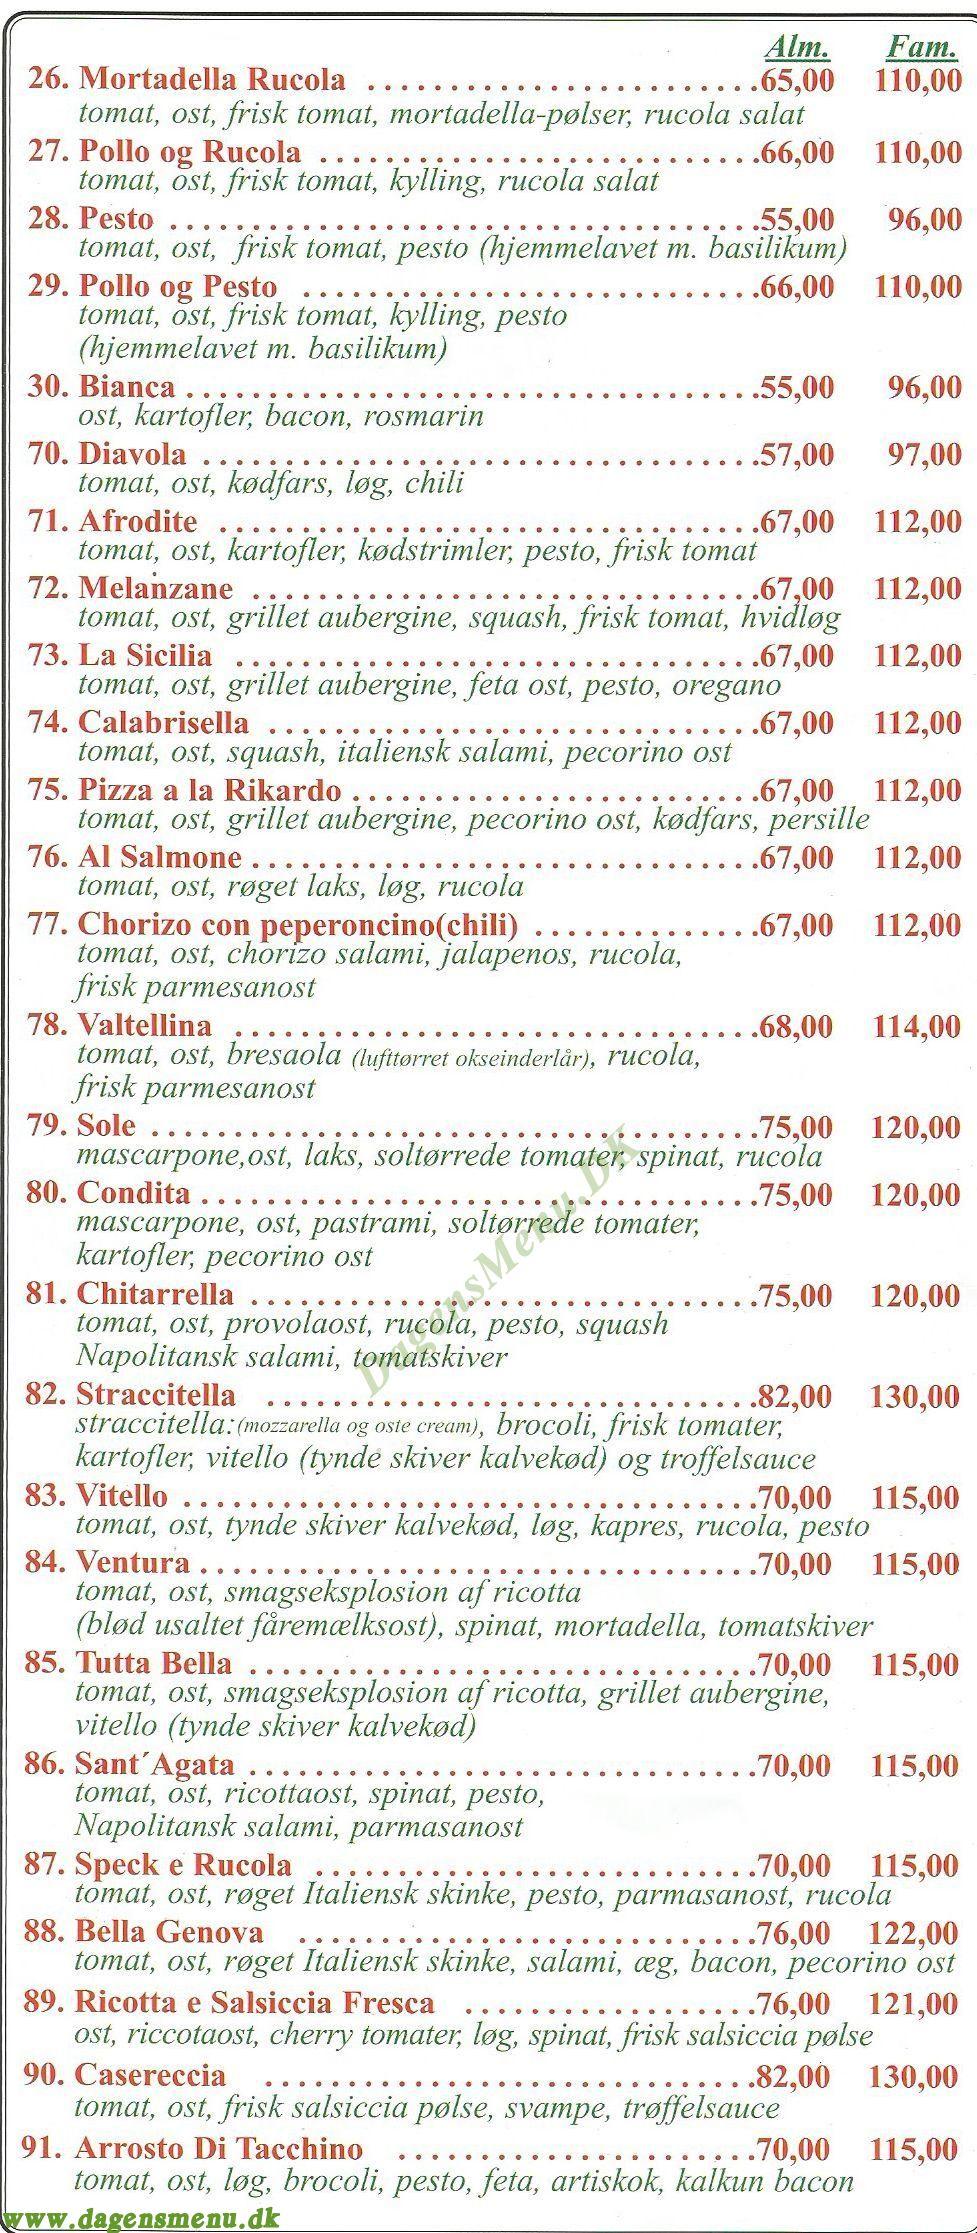 Gastronomia Pizzaria - Menukort